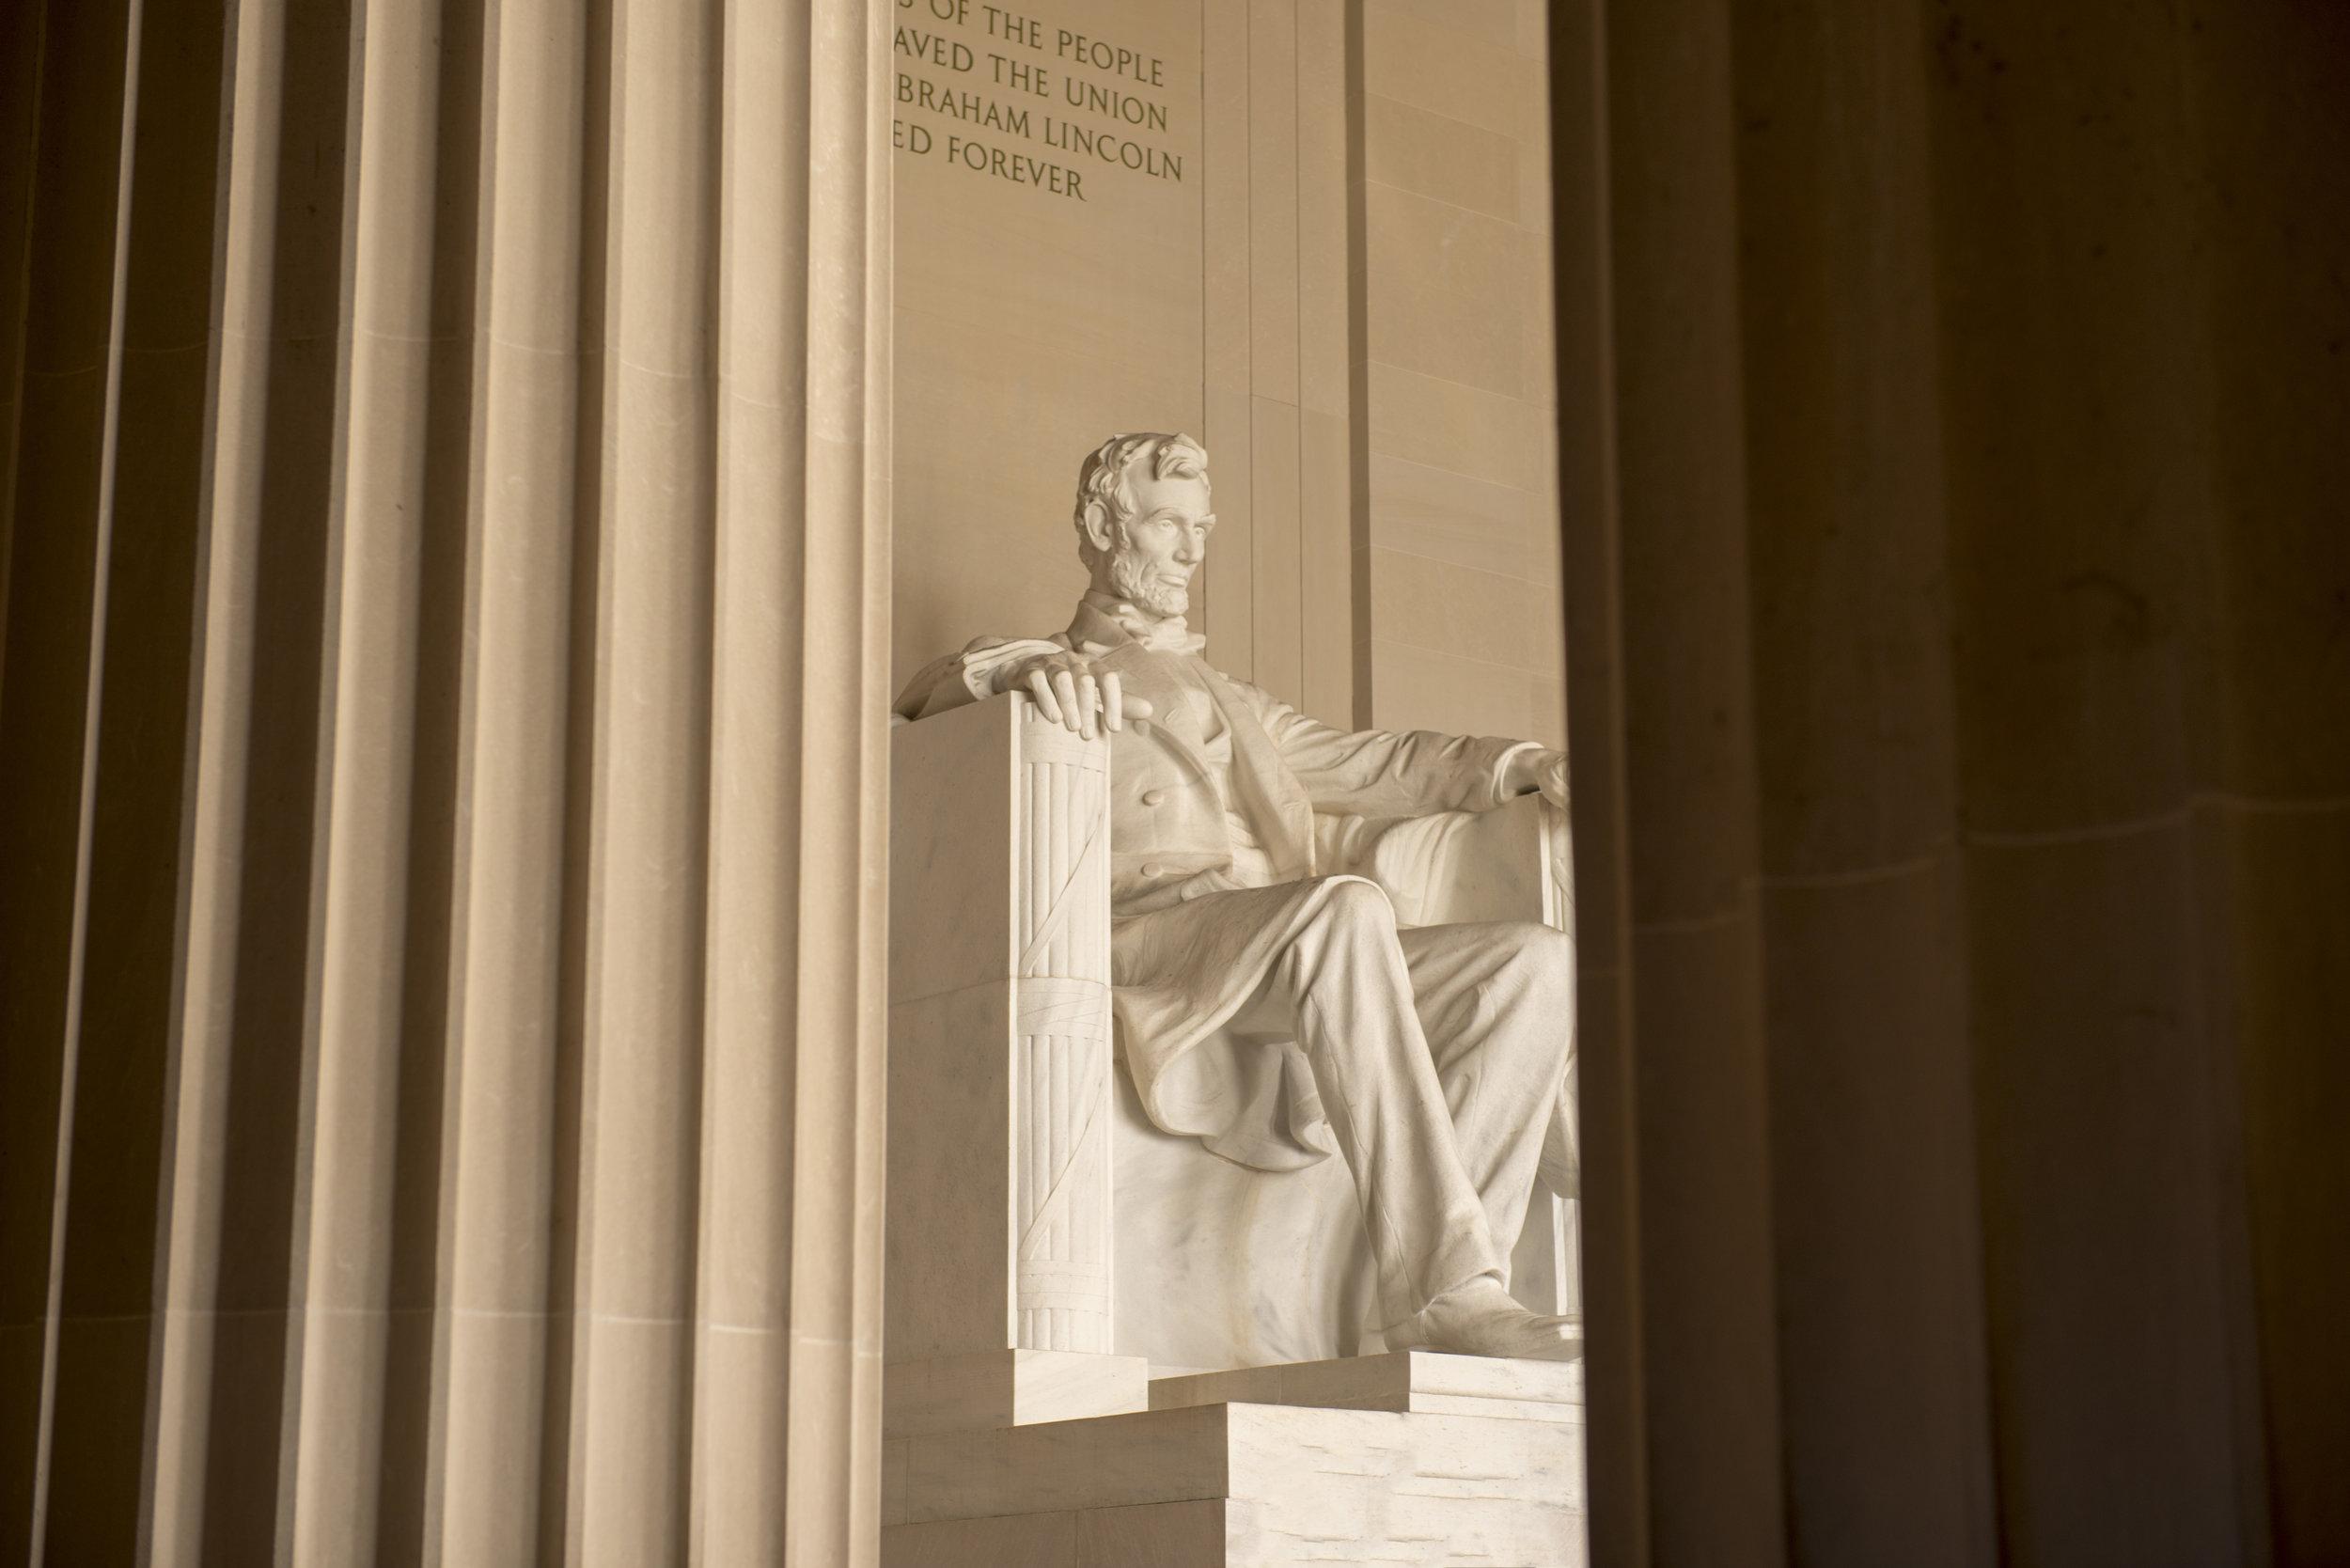 Lincoln Memorial, 2018